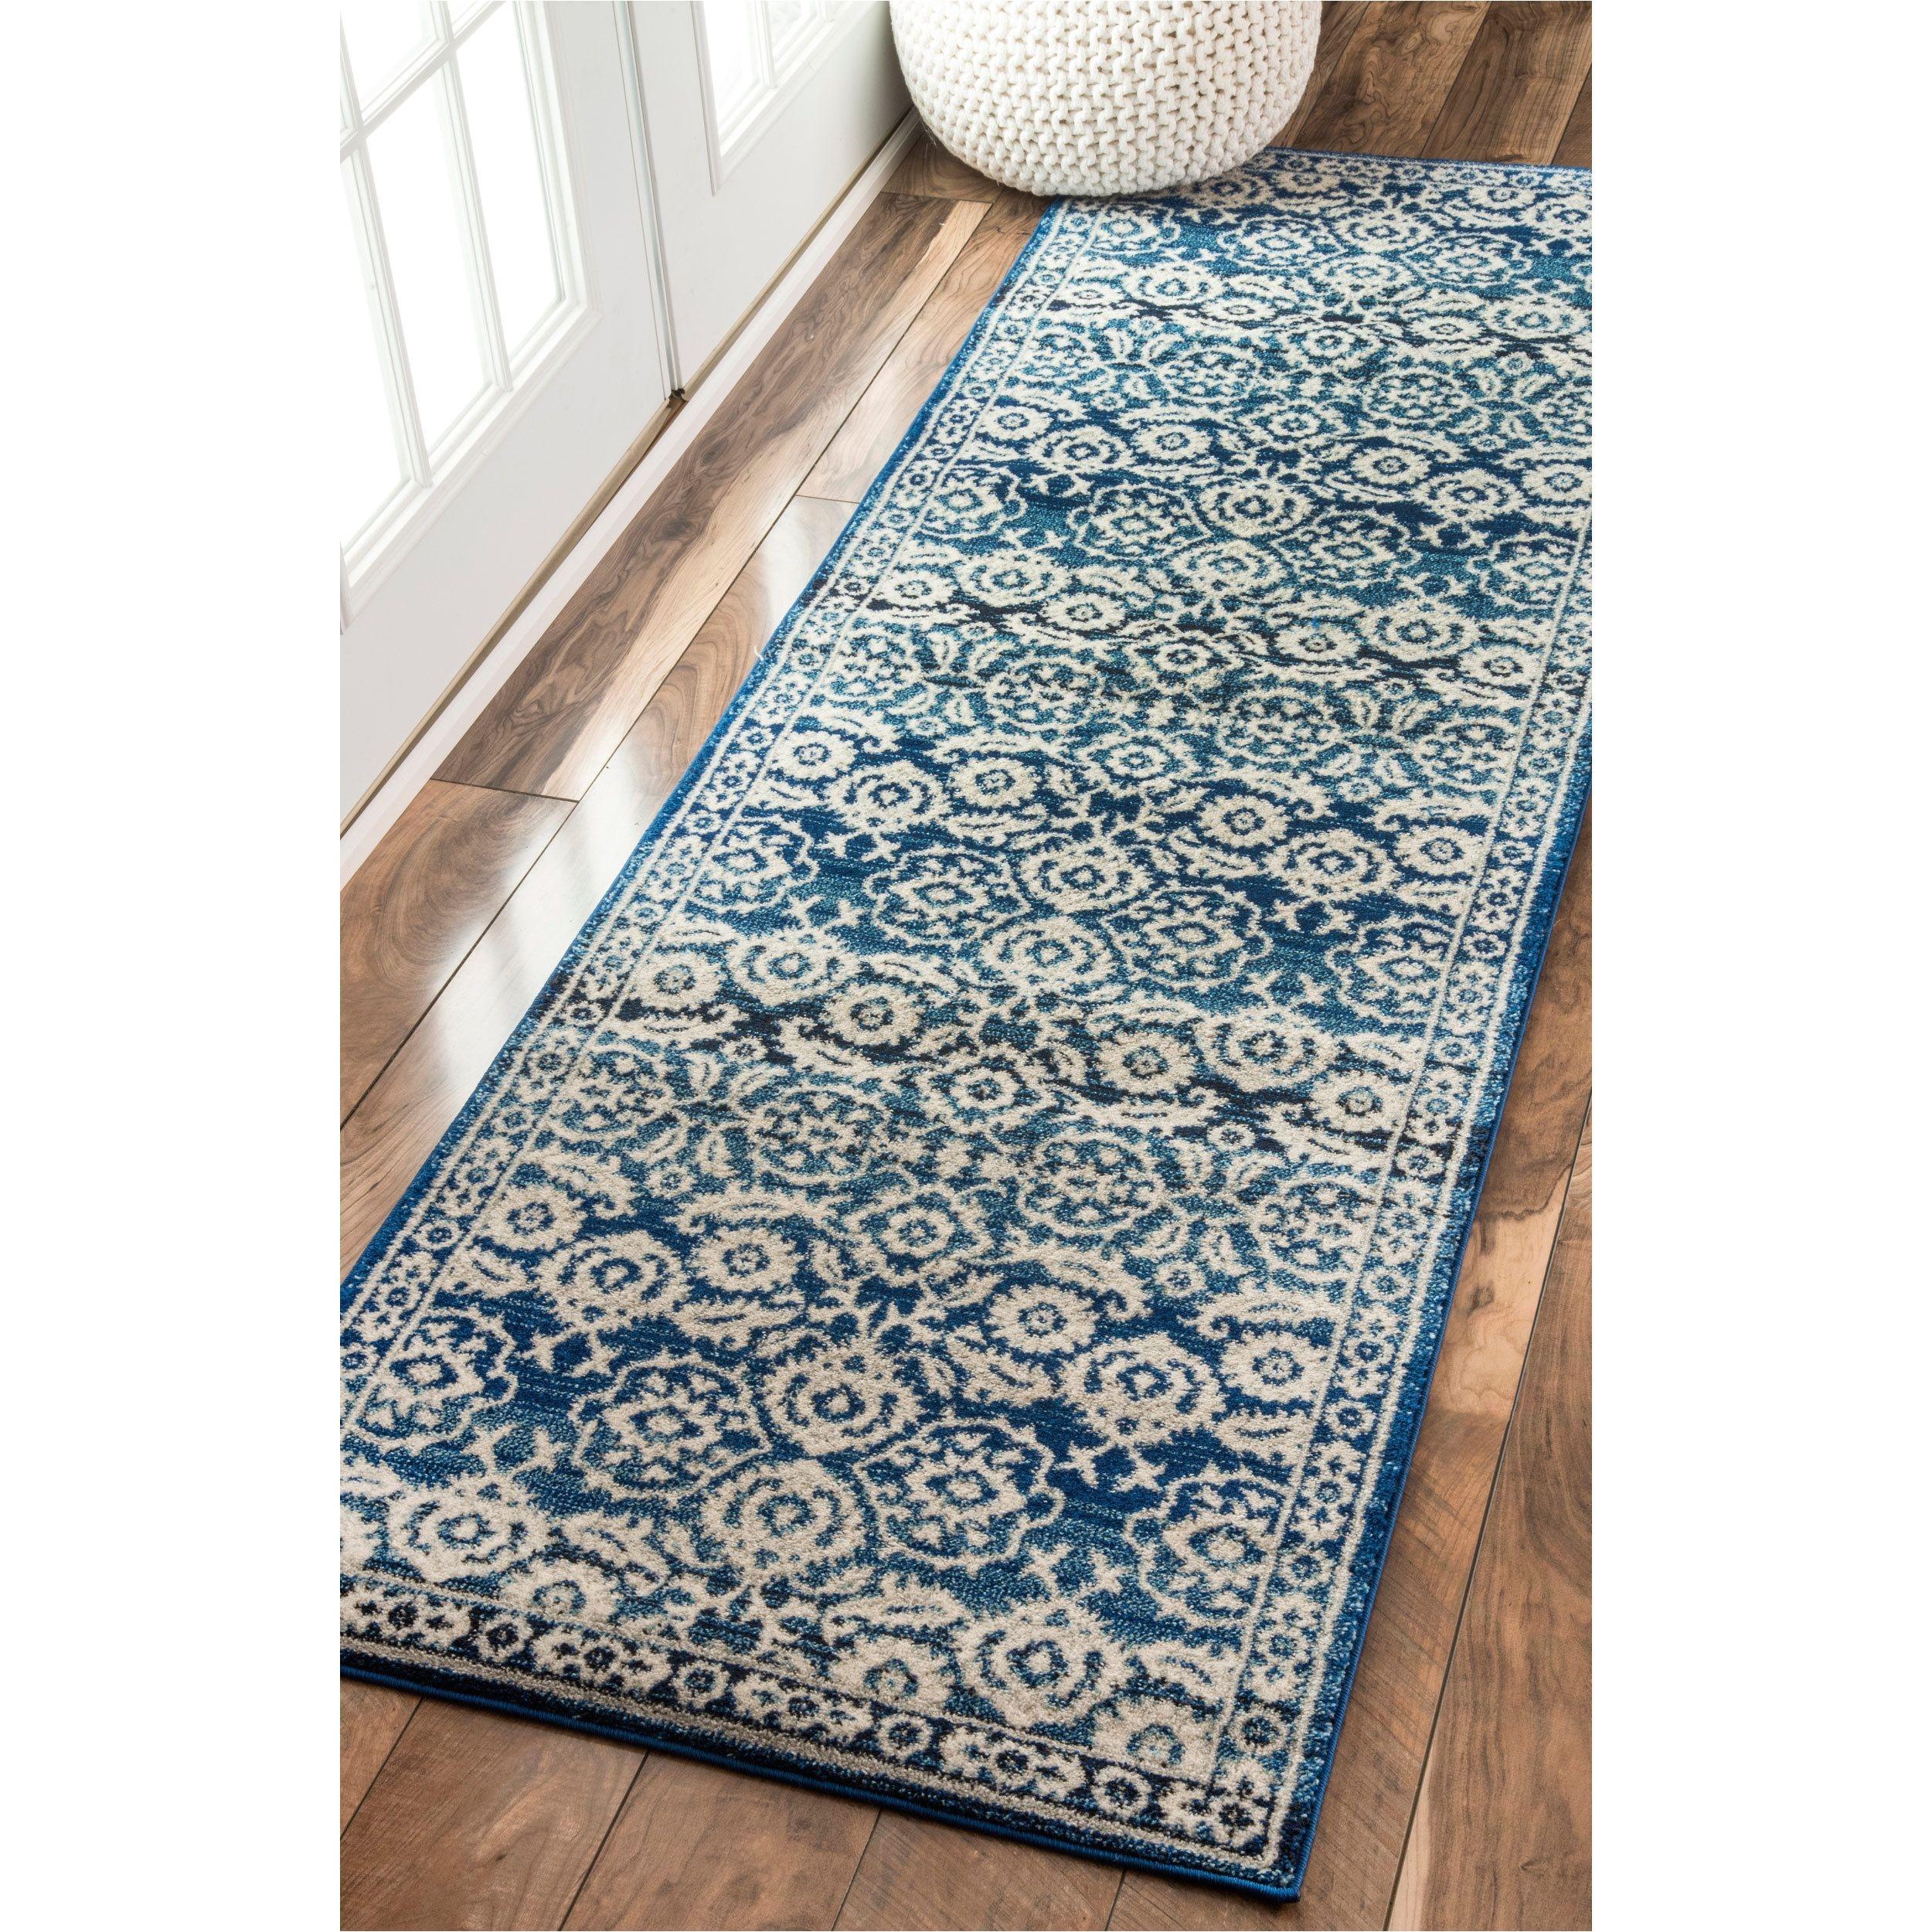 nuloom traditional persian vintage dark blue runner rug 2 8 x 8